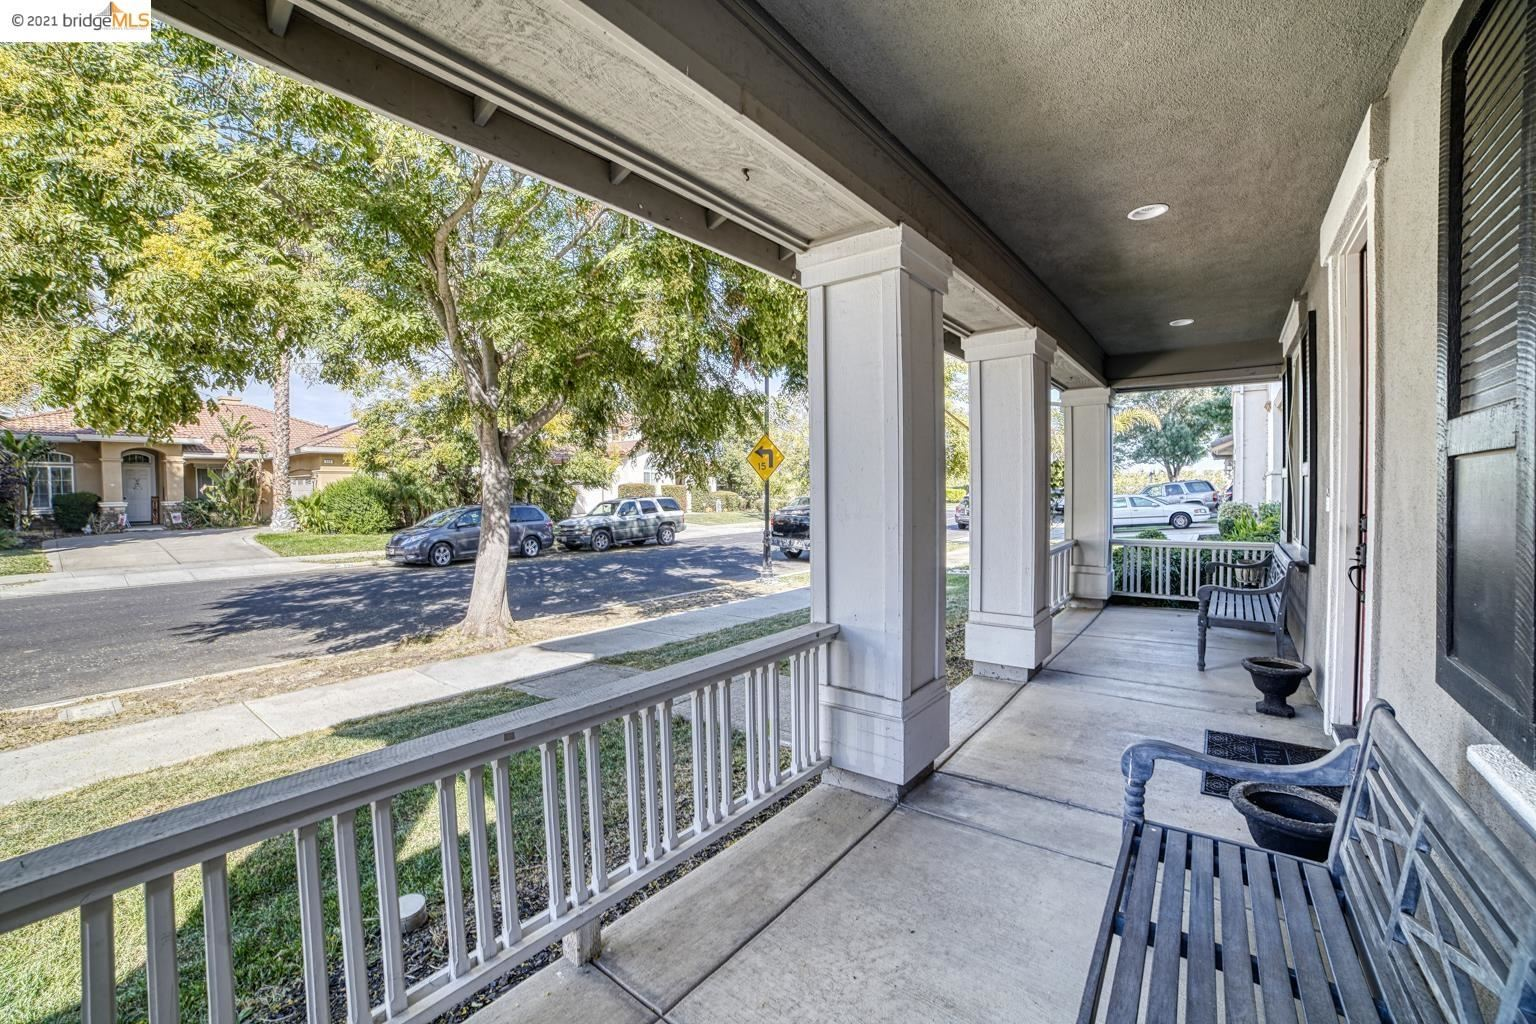 Photo of 538 Vivian St, Brentwood, CA 94513 (MLS # 40971096)